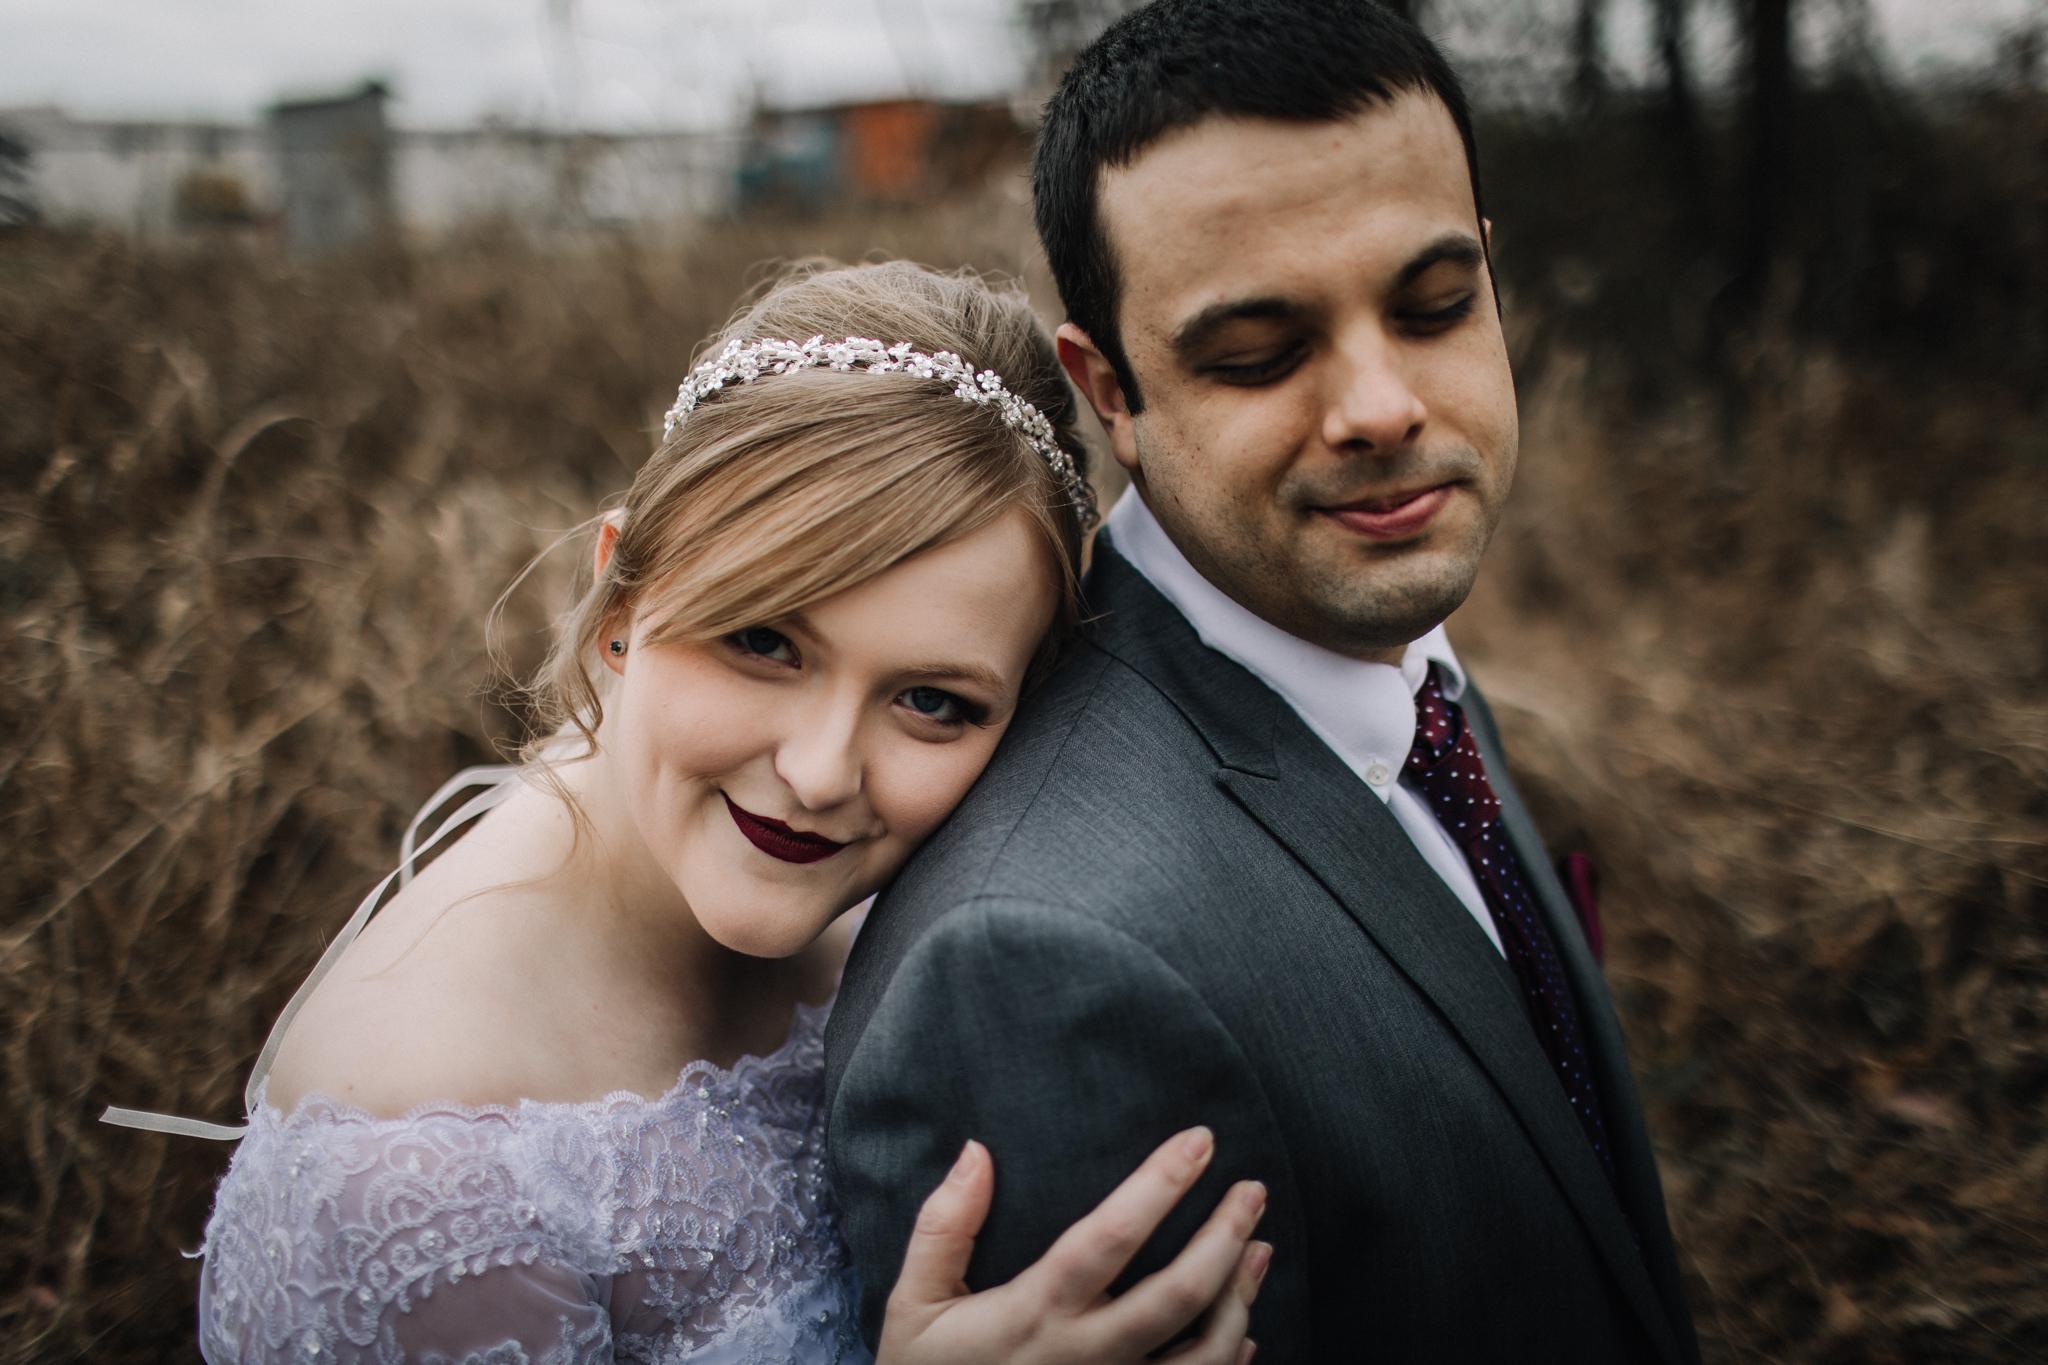 billie-shaye-style-photography-www.billieshayestyle.com-winter-wedding-the-belle-hollow-clarksville-tennessee-9077.jpg